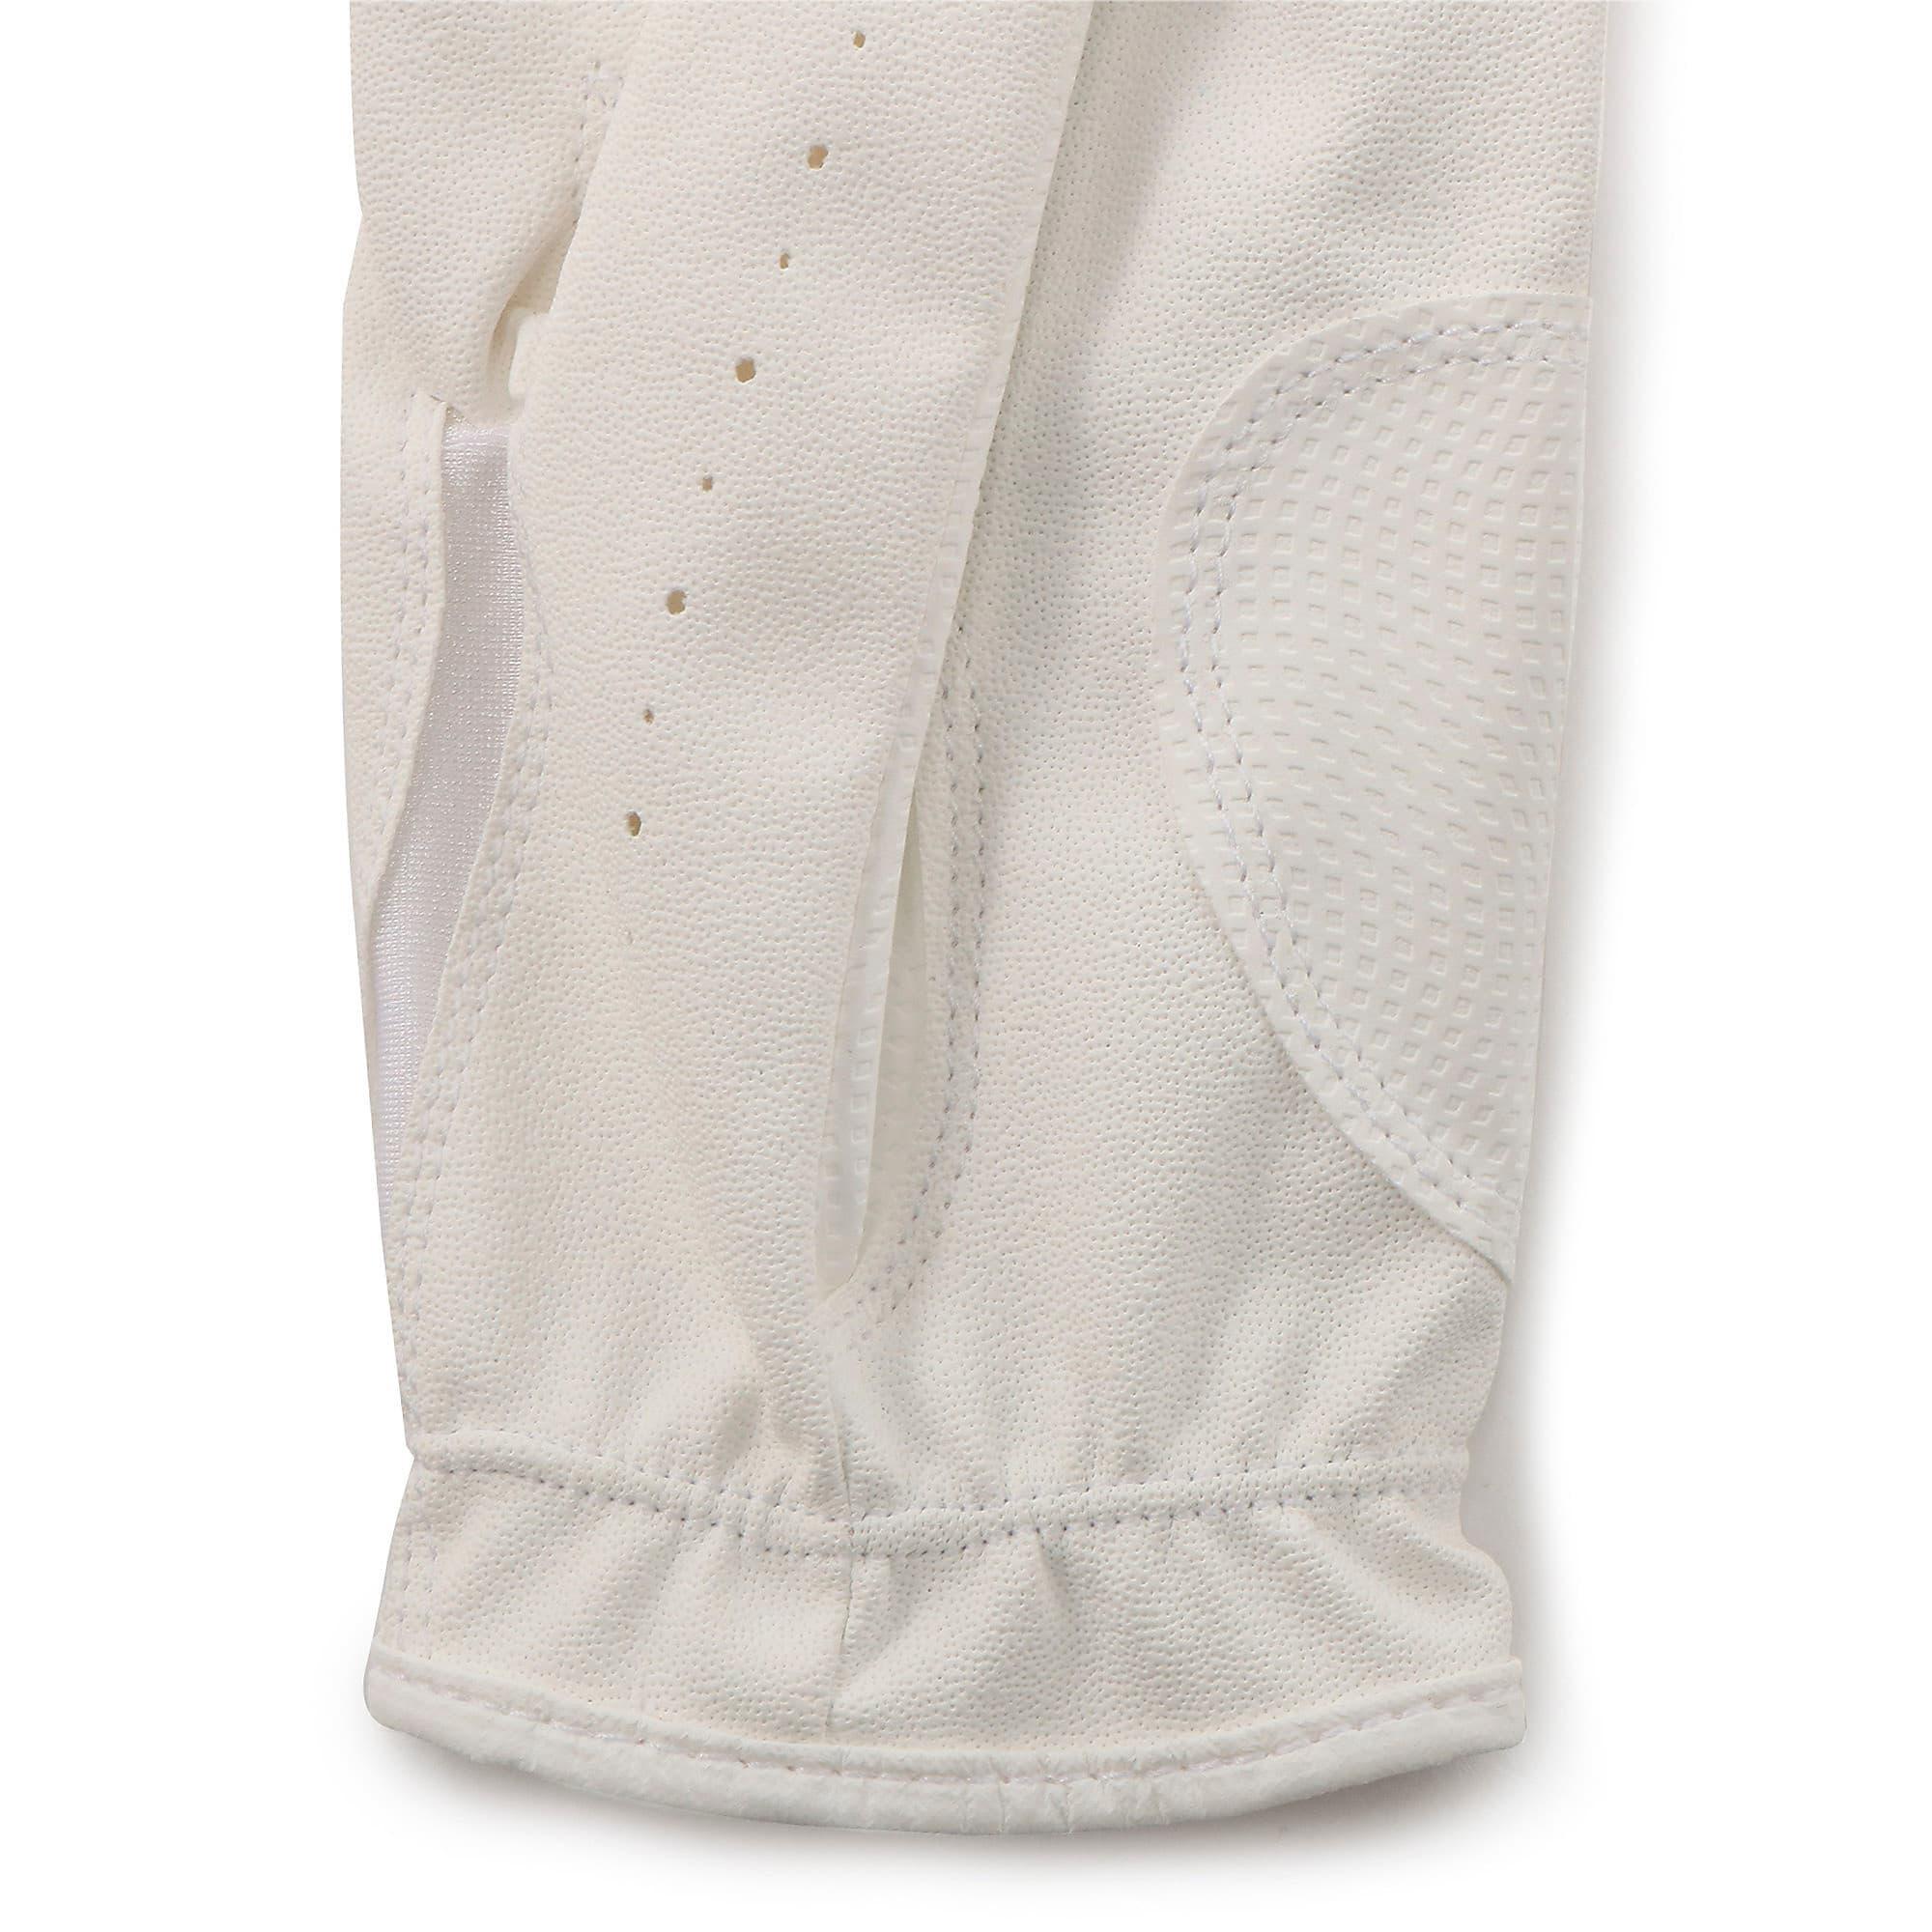 Thumbnail 5 of ゴルフ 3D ウィメンズ パフォーマンス グローブ 両手用, White / White, medium-JPN